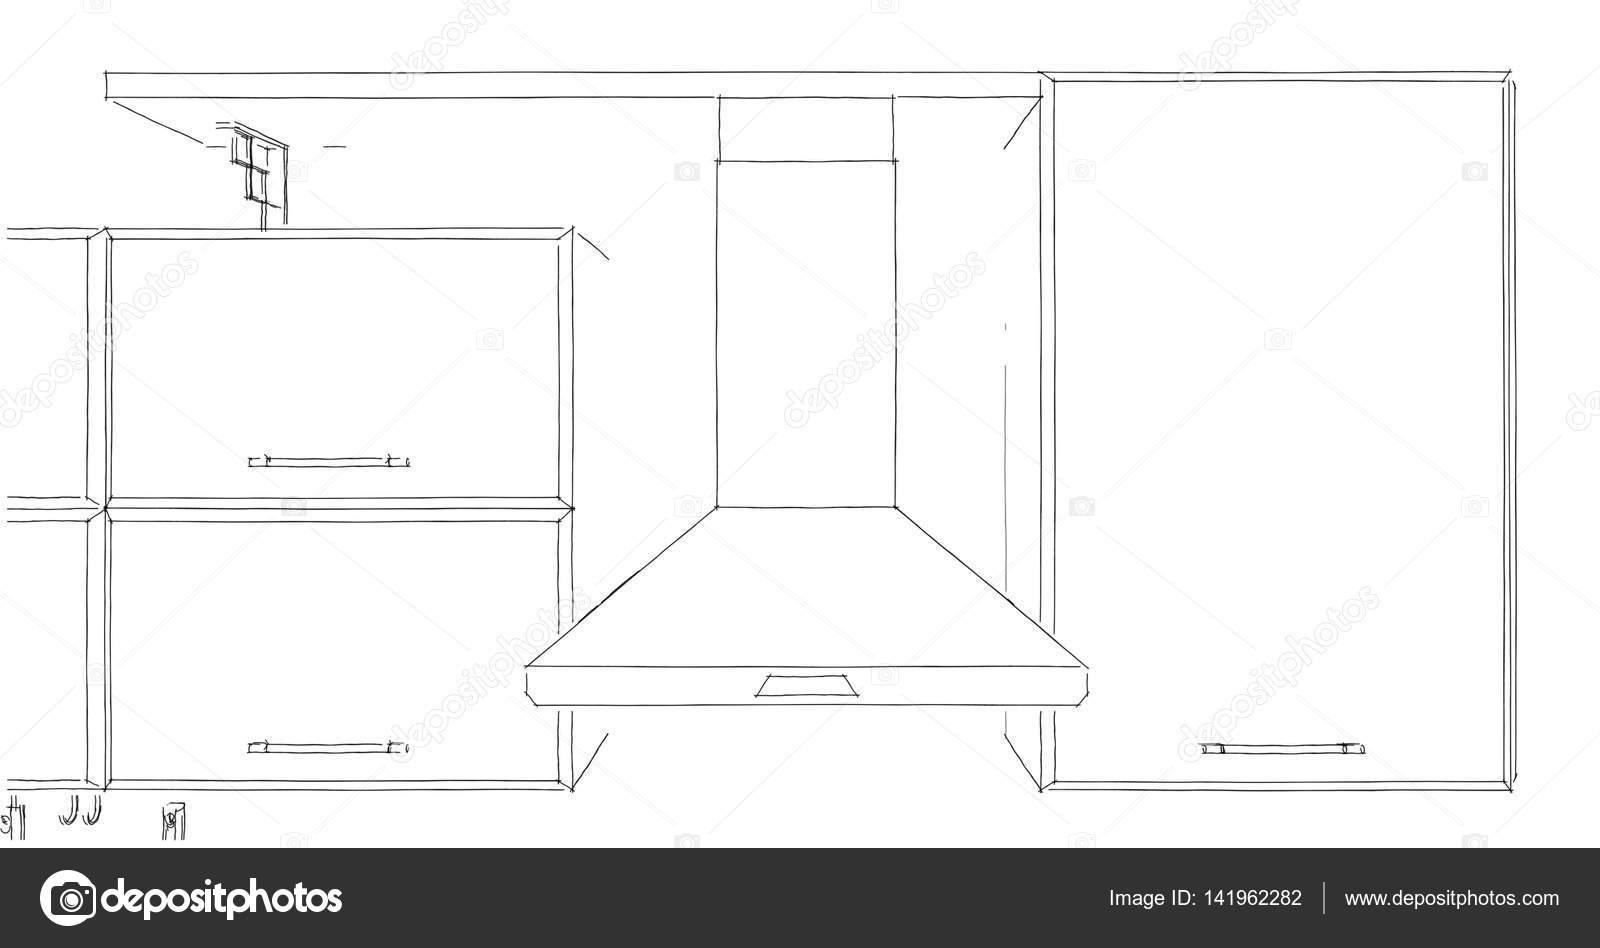 Cucine in muratura rustiche idee per la casa in campagna for Diotti arredamenti opinioni